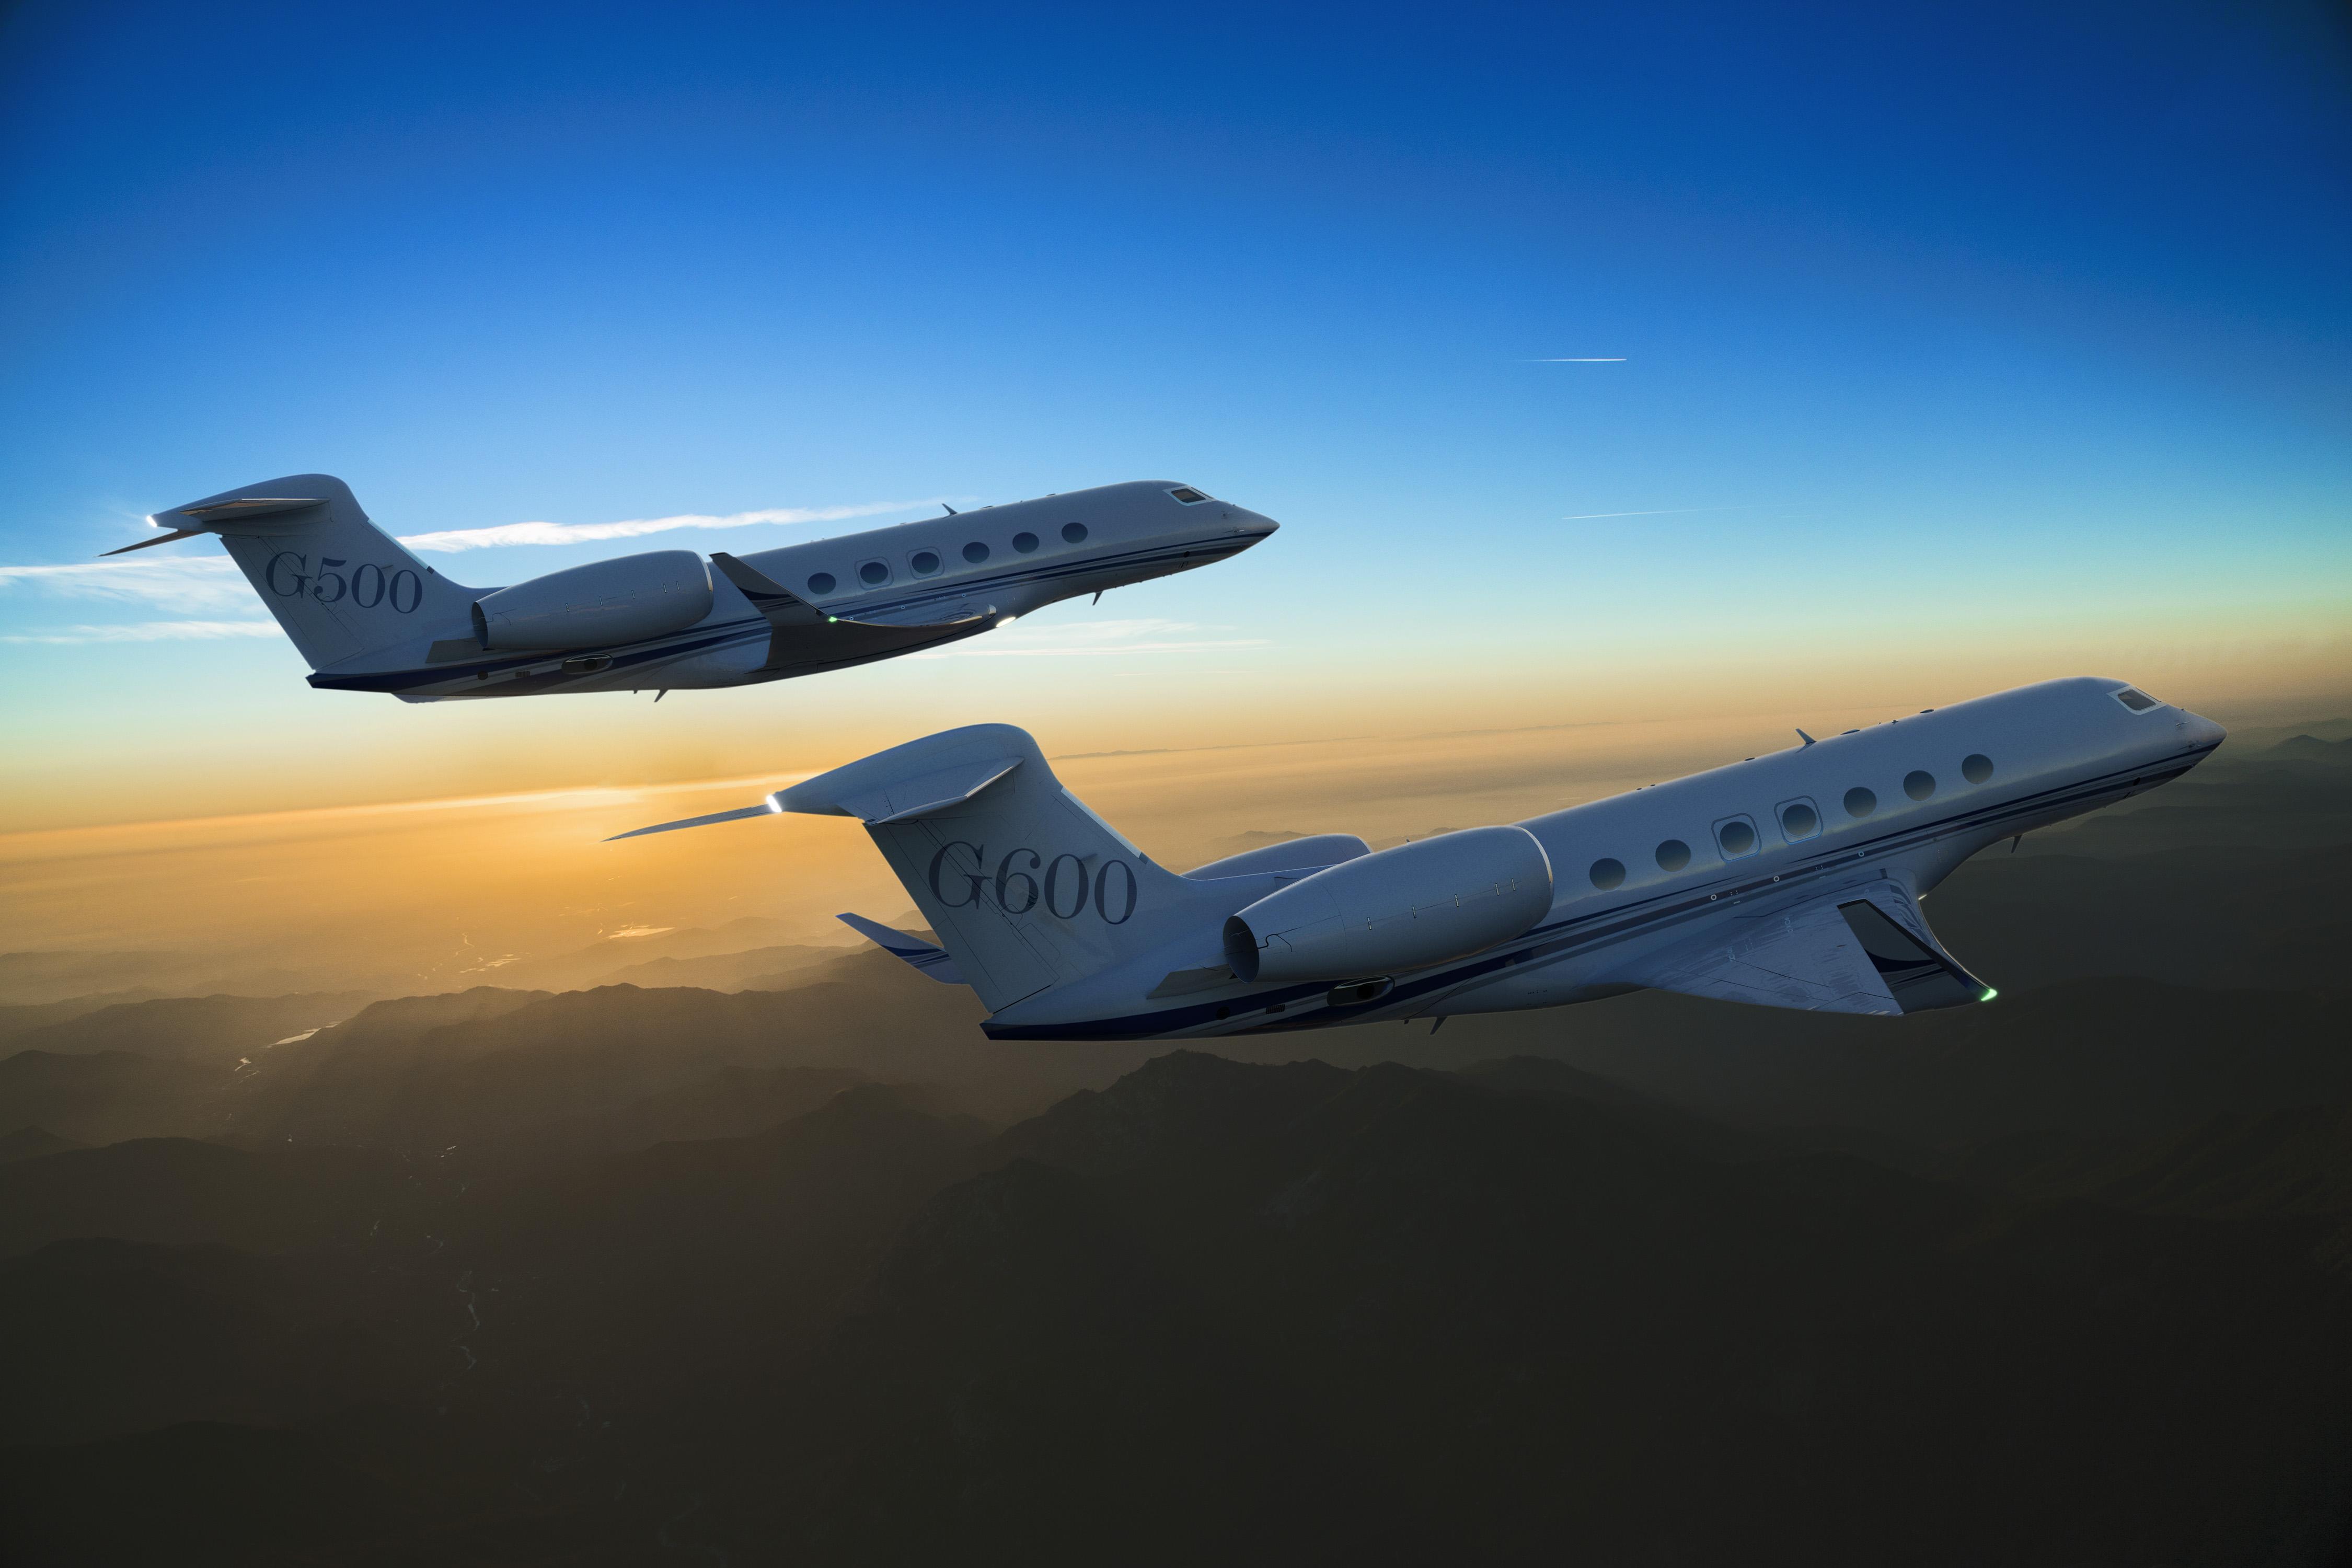 The Gulfstream G500 and G600